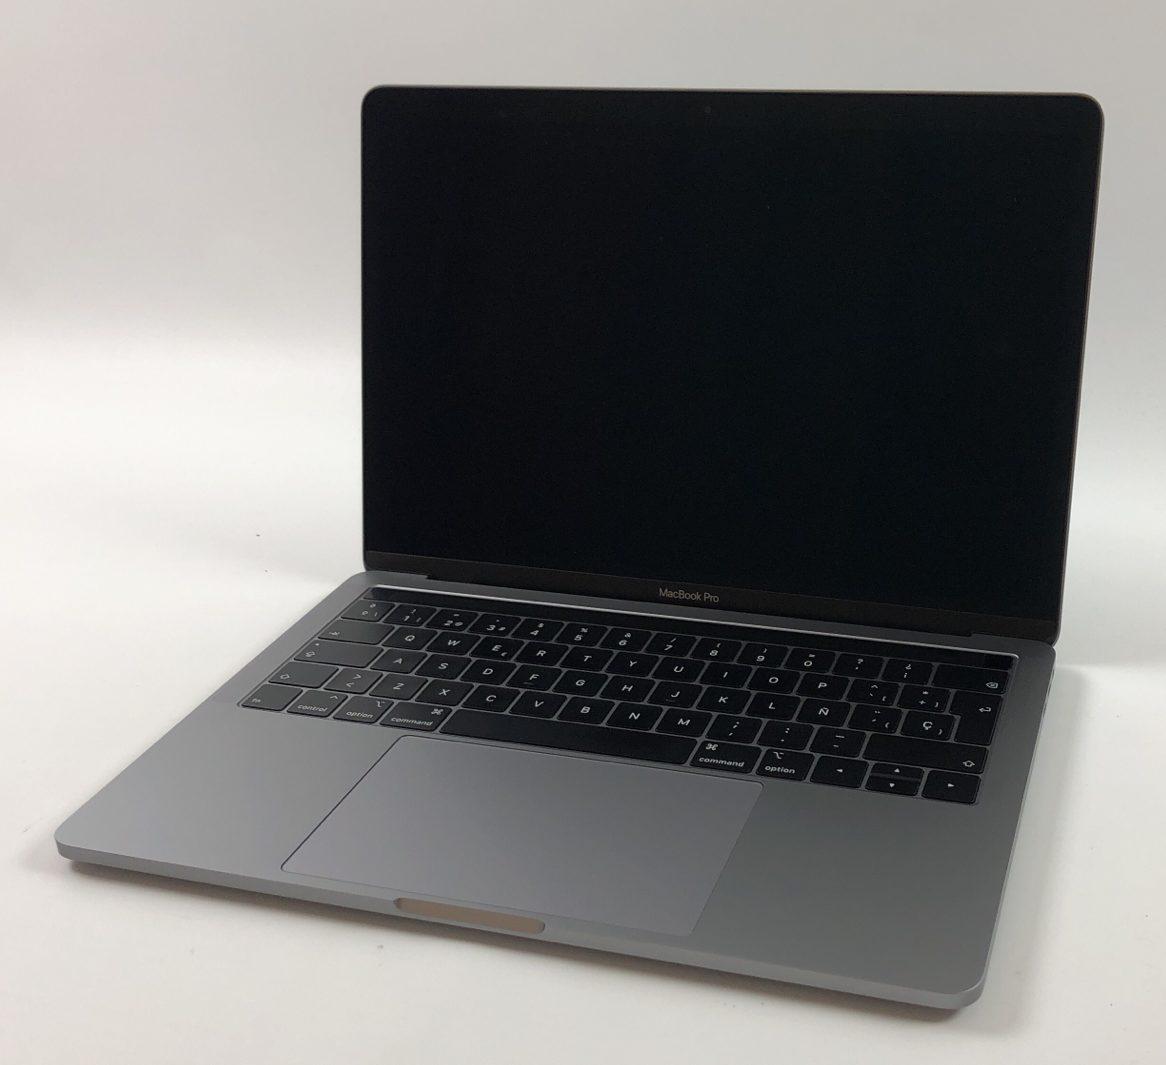 "MacBook Pro 13"" 4TBT Mid 2018 (Intel Quad-Core i5 2.3 GHz 8 GB RAM 256 GB SSD), Space Gray, Intel Quad-Core i5 2.3 GHz, 8 GB RAM, 256 GB SSD, imagen 1"